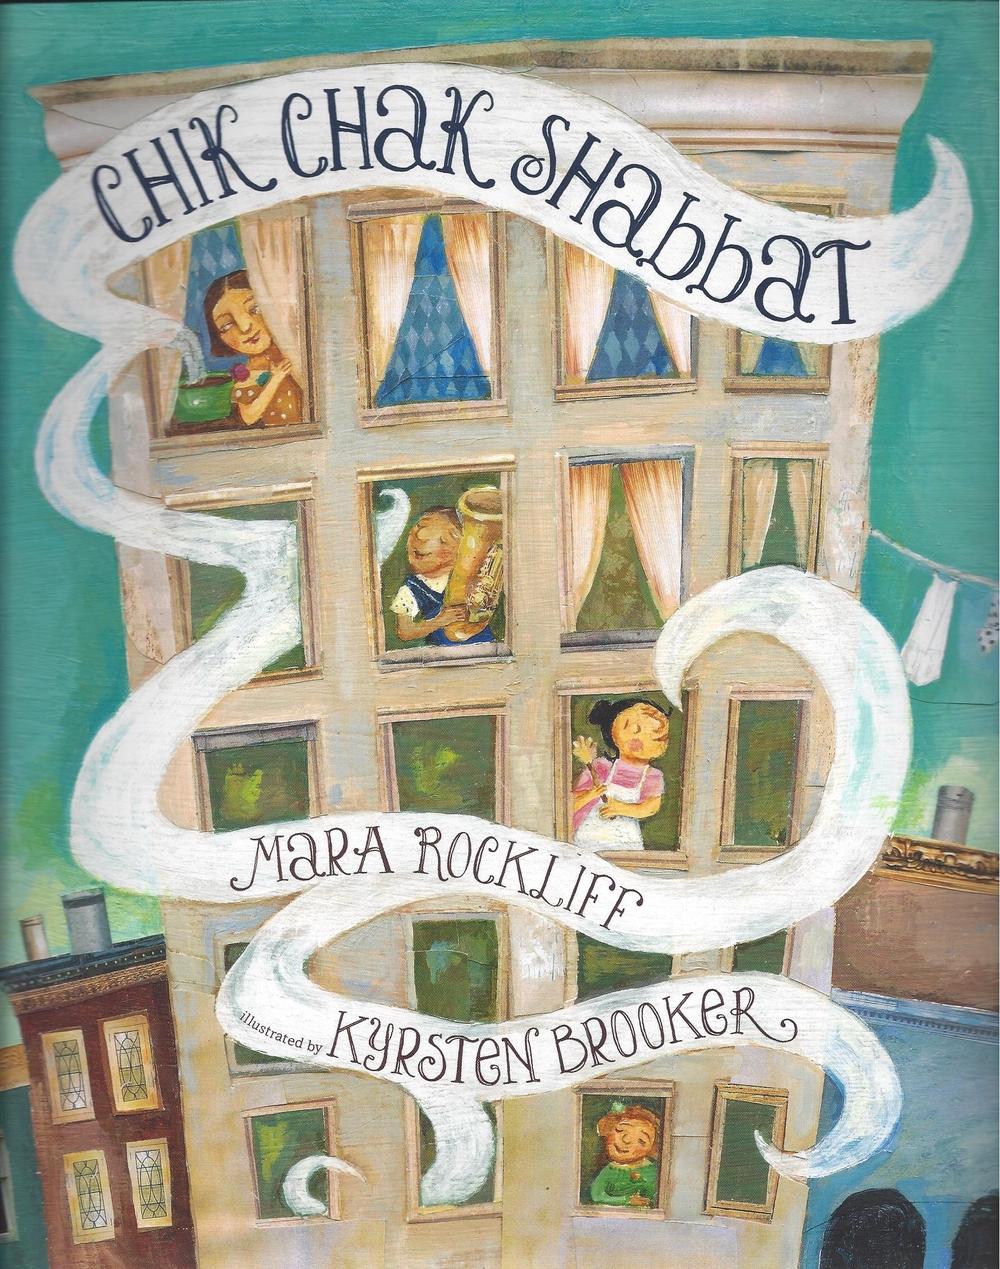 Chik Chak Shabbat